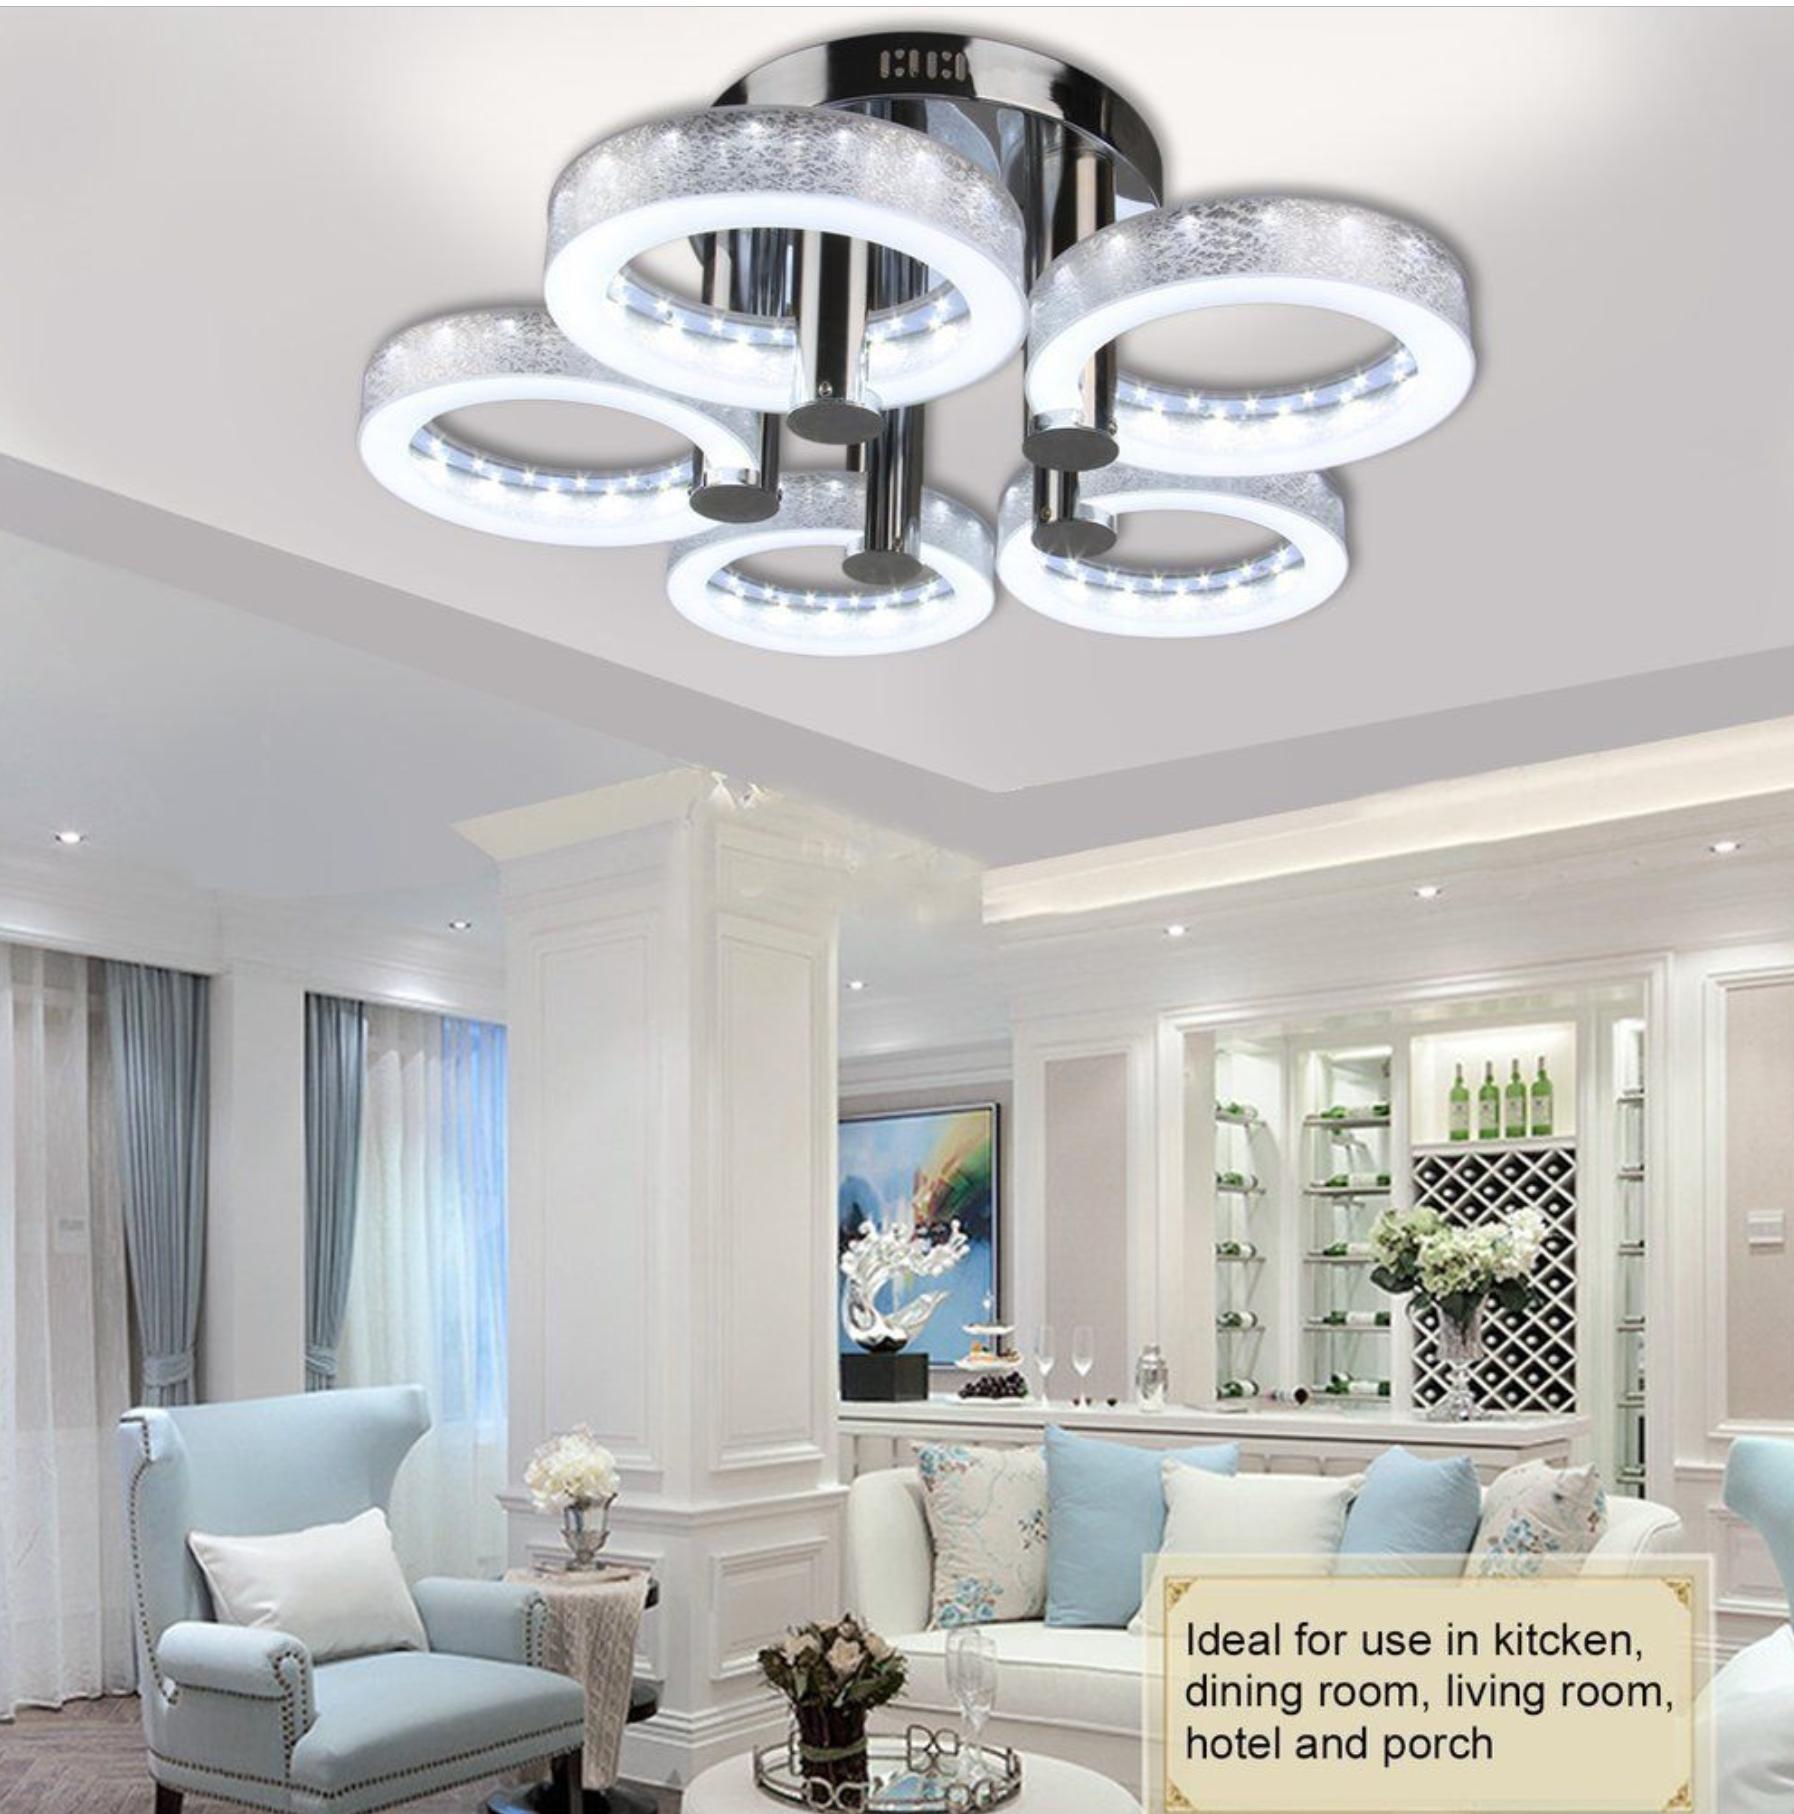 European Modern Round Acrylic Chandelier Ceiling Pendant Light 5 18w Led Lamp Bp Ceiling Lamp Ceiling Lights Ceiling Lights Living Room